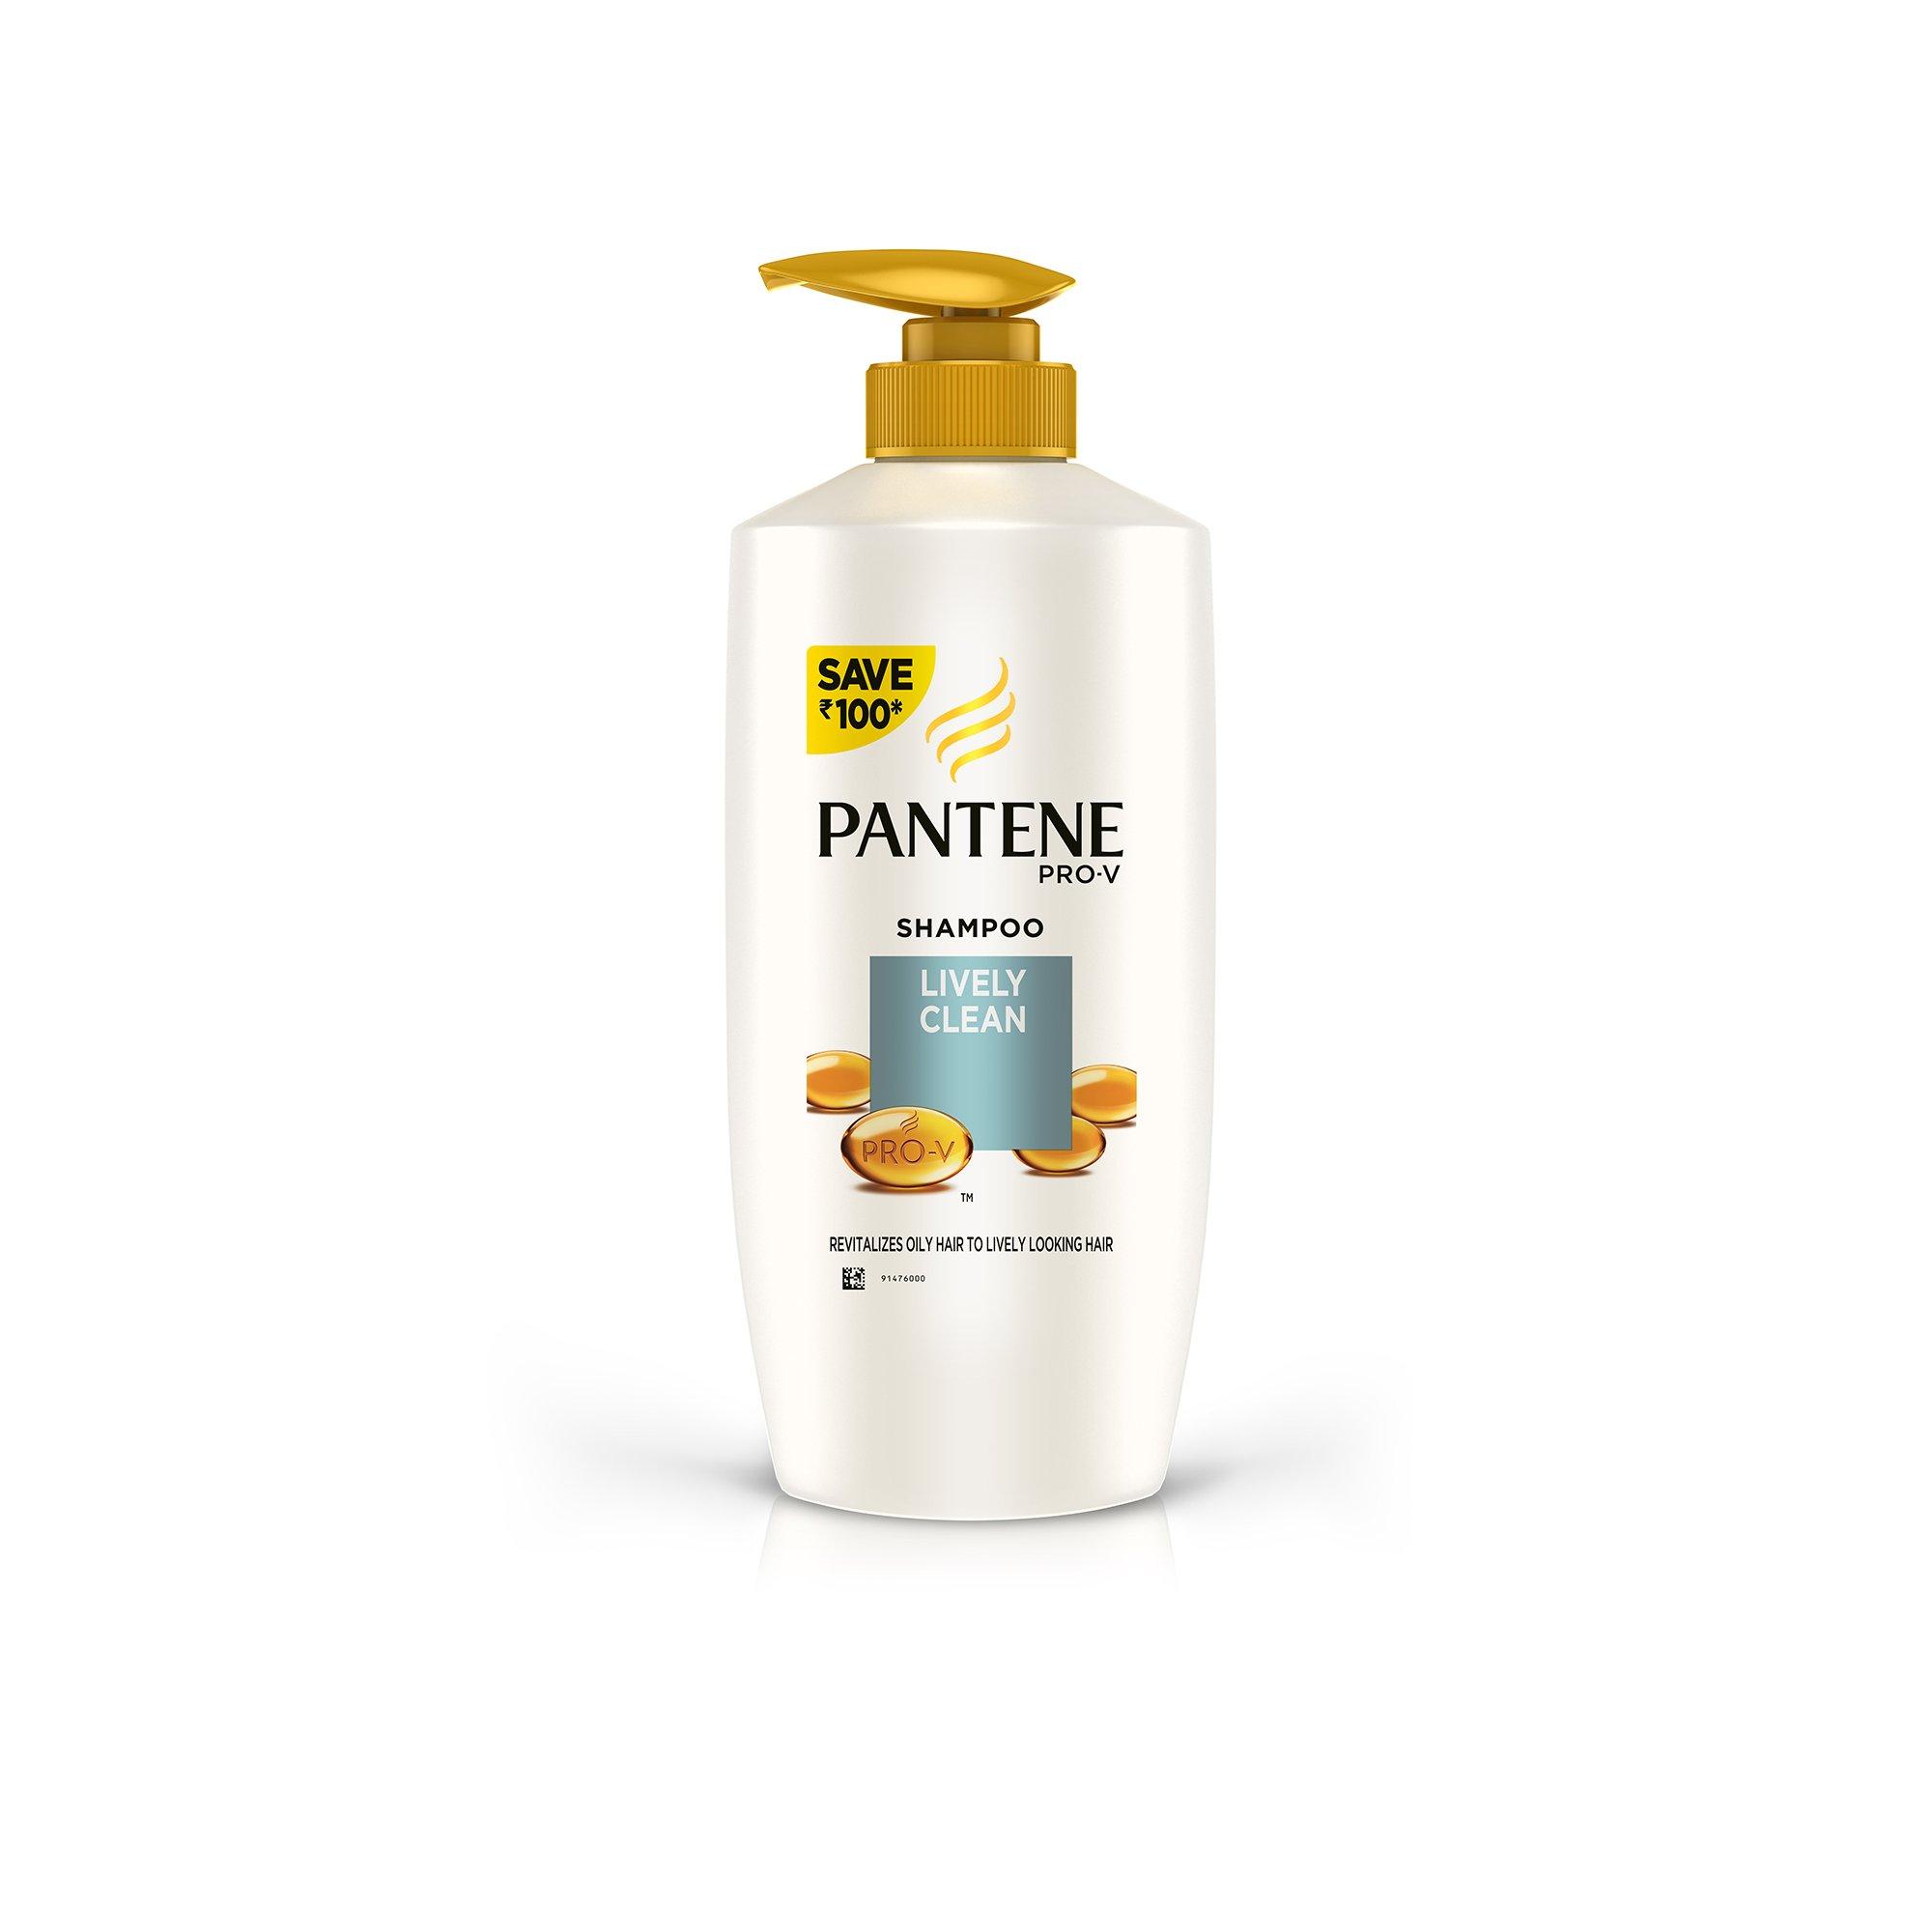 Pantene Lively Clean Shampoo, 675ml product image